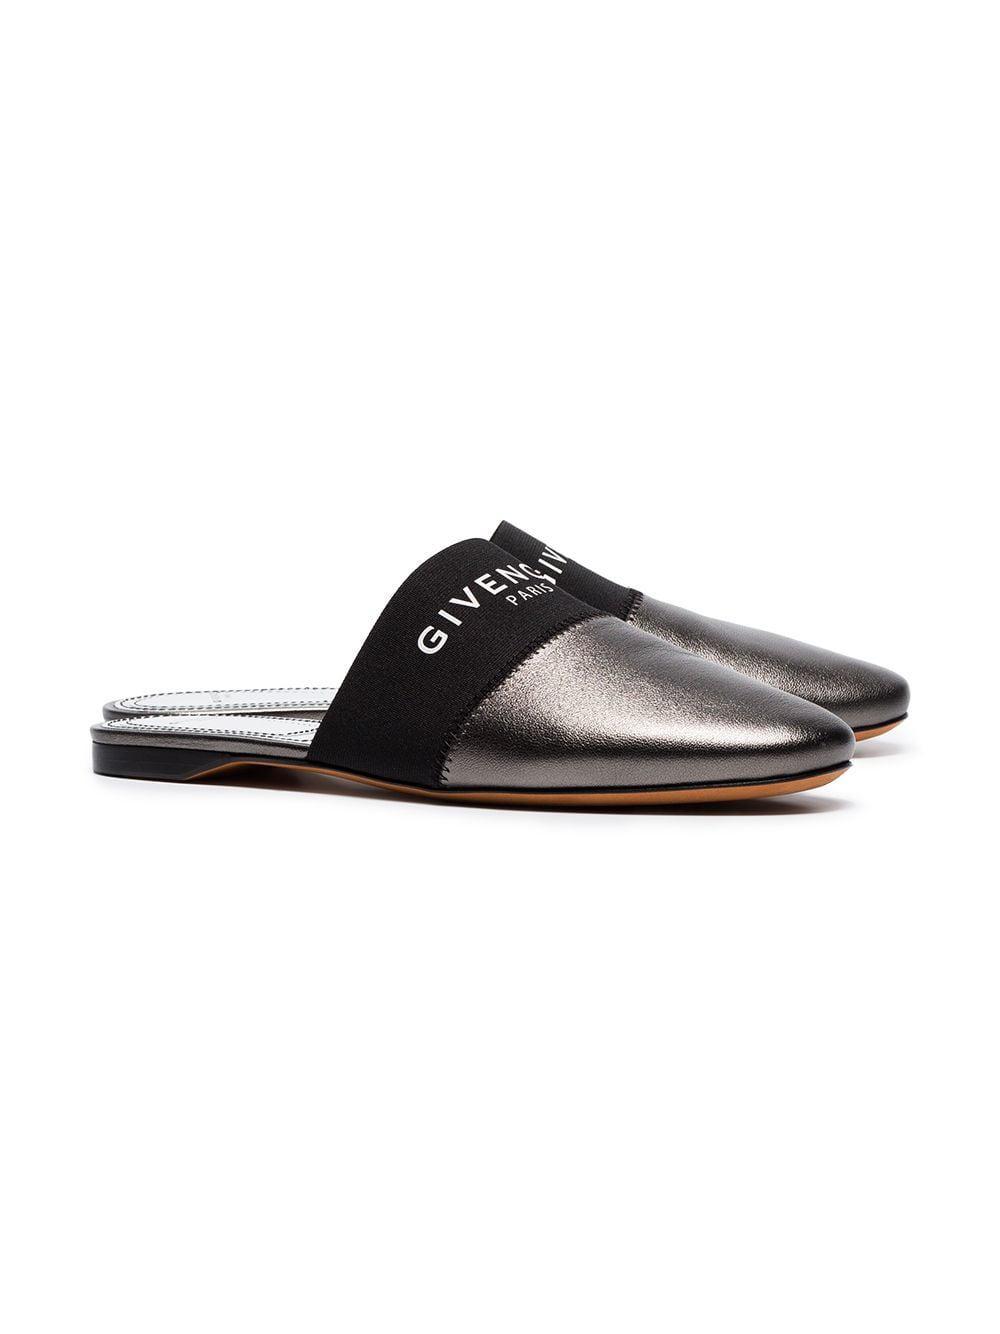 785ffa67ecb0 Givenchy - Multicolor Metallic Bedford Leather Slippers - Lyst. View  fullscreen